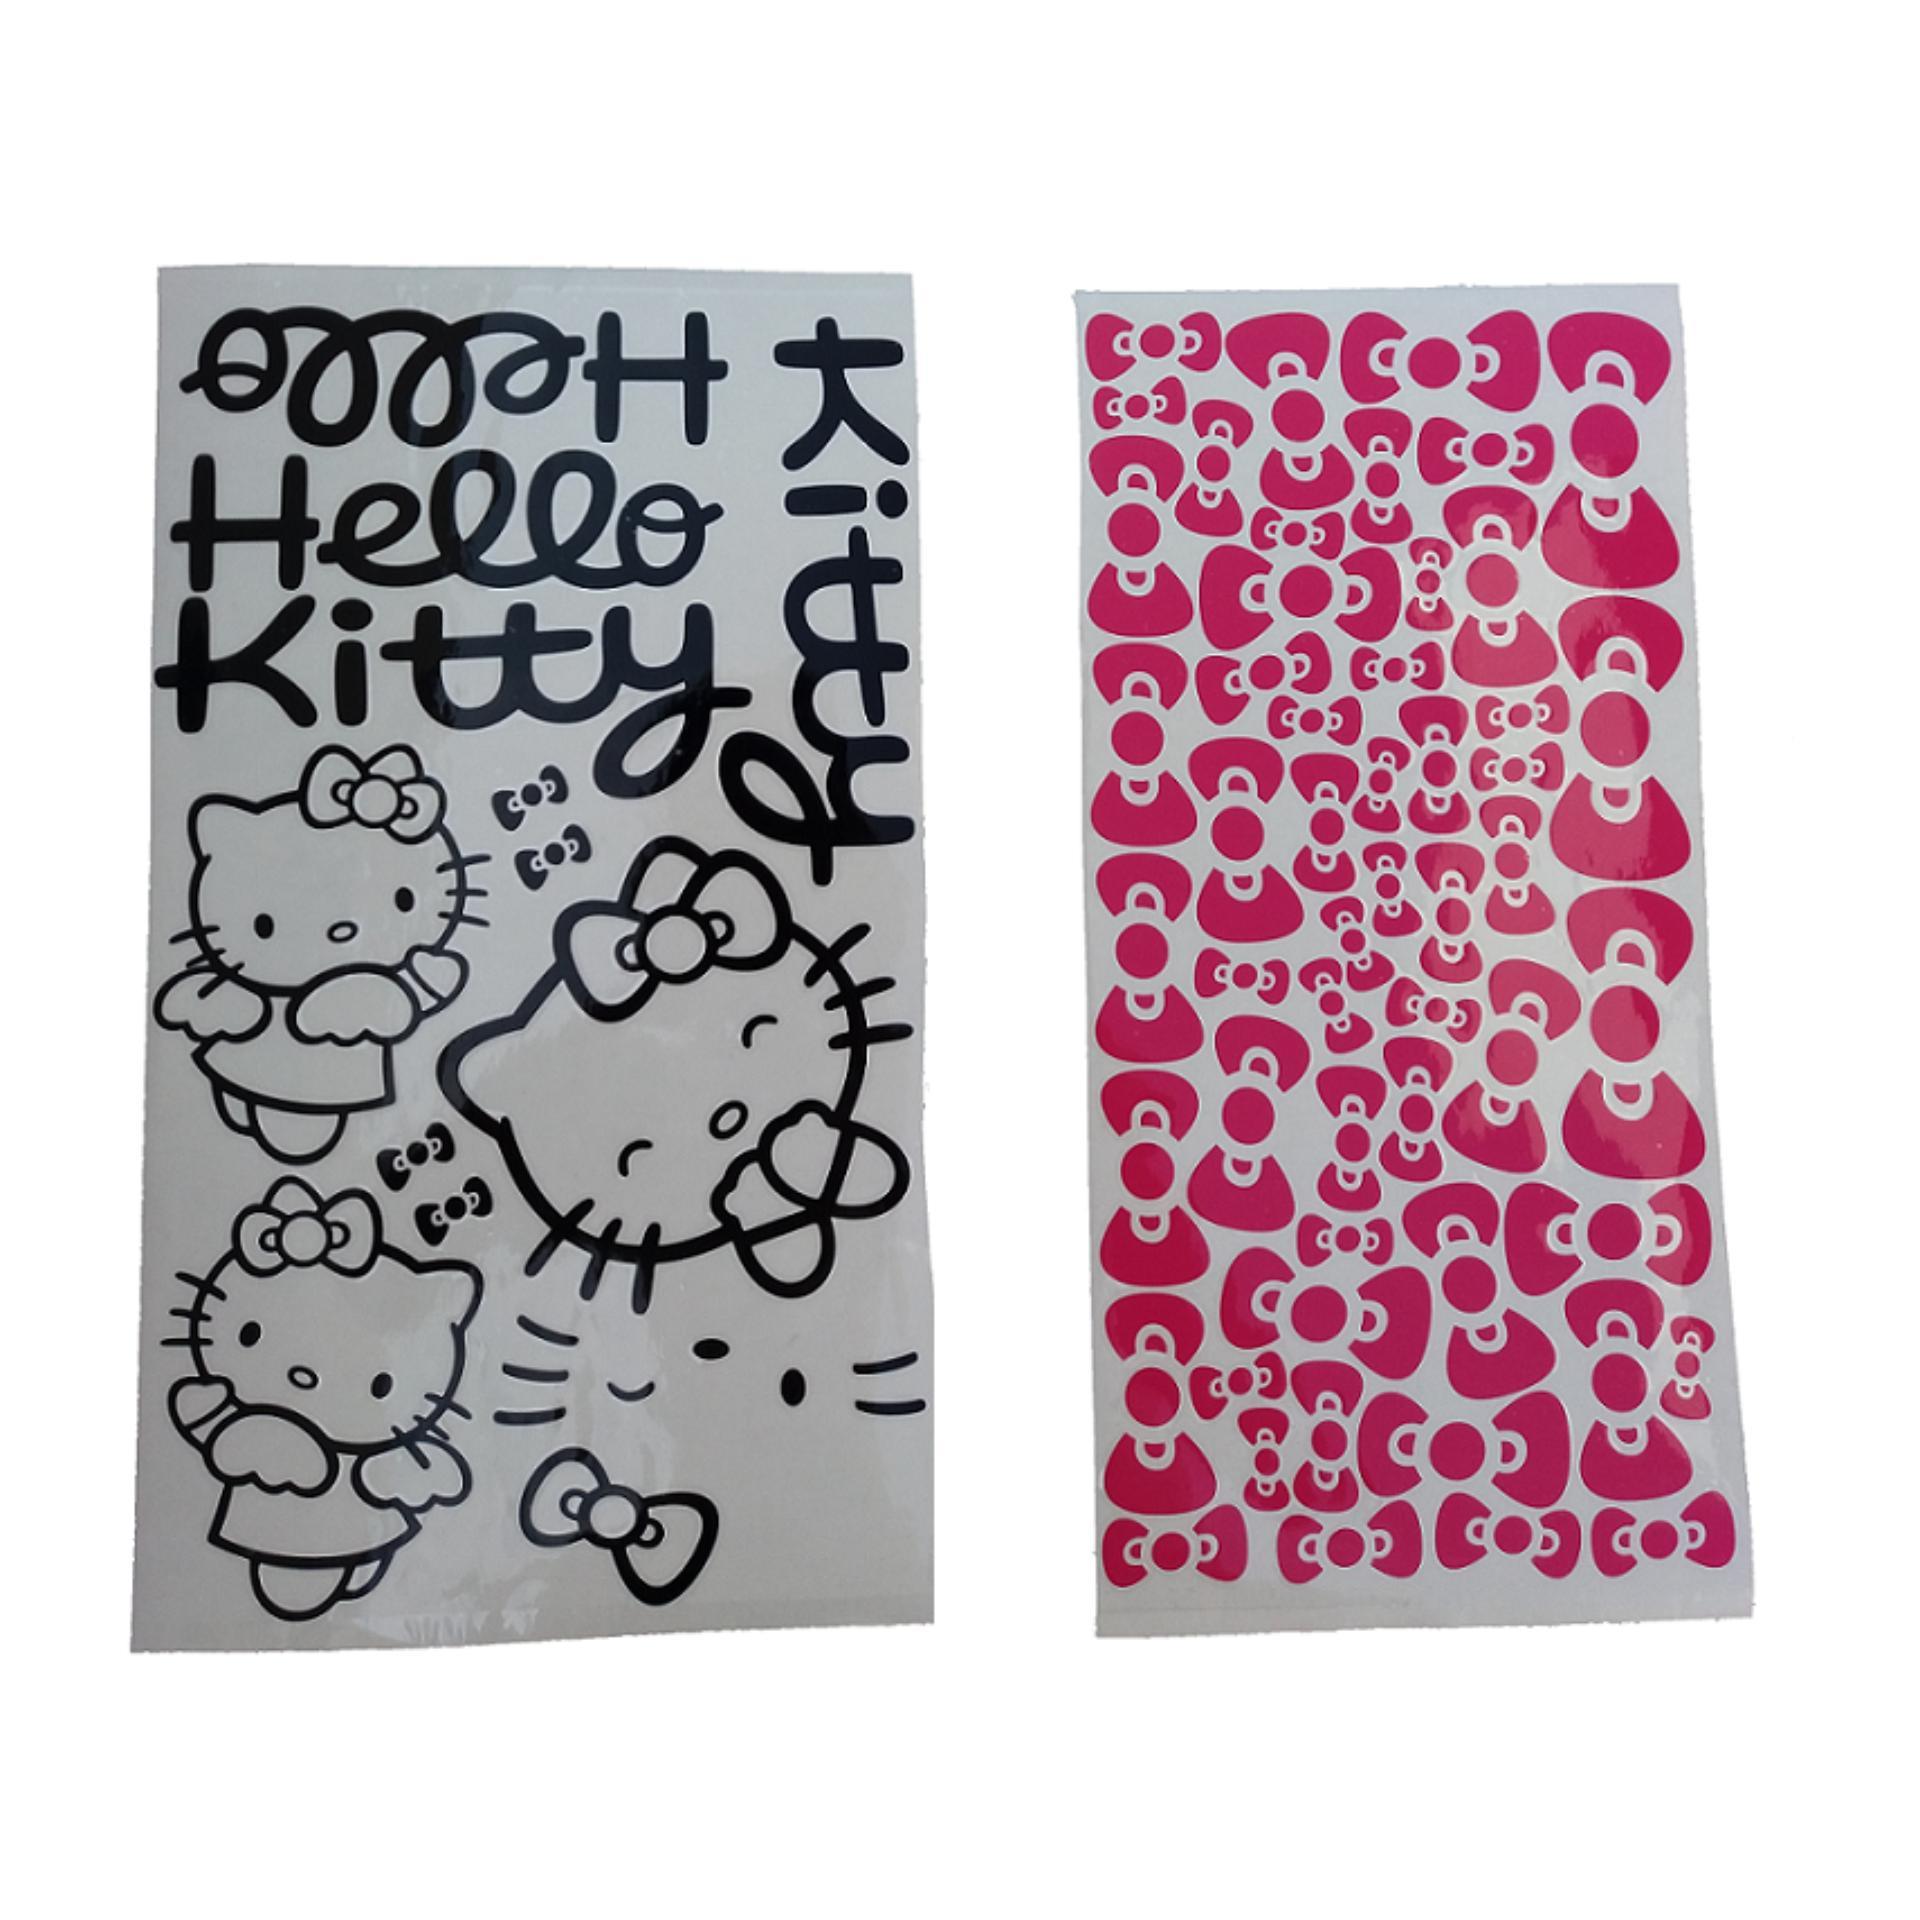 Cek Harga Baru Hello Kitty Karakter Universal Cutting Sticker Motor Gambar Produk Rinci Terkini